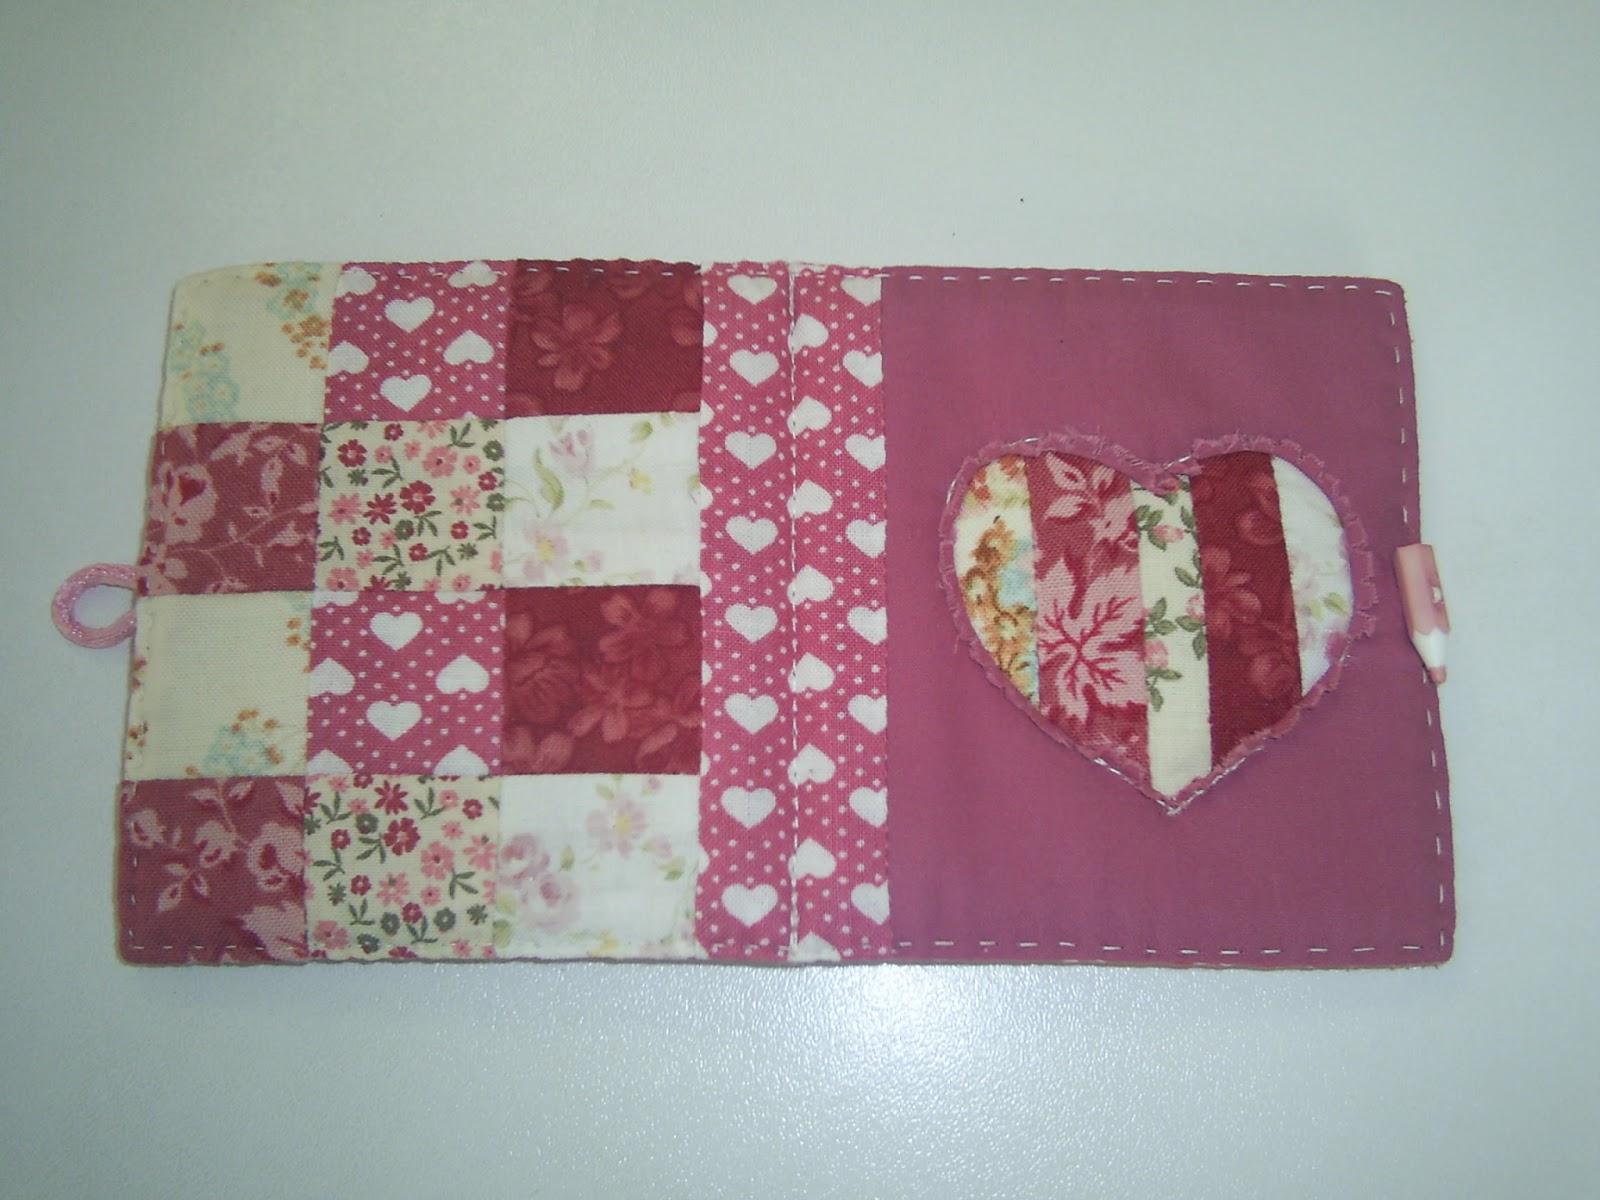 Bel n patchwork proyecto del fin de semana guarda agujas - Proyectos de patchwork ...